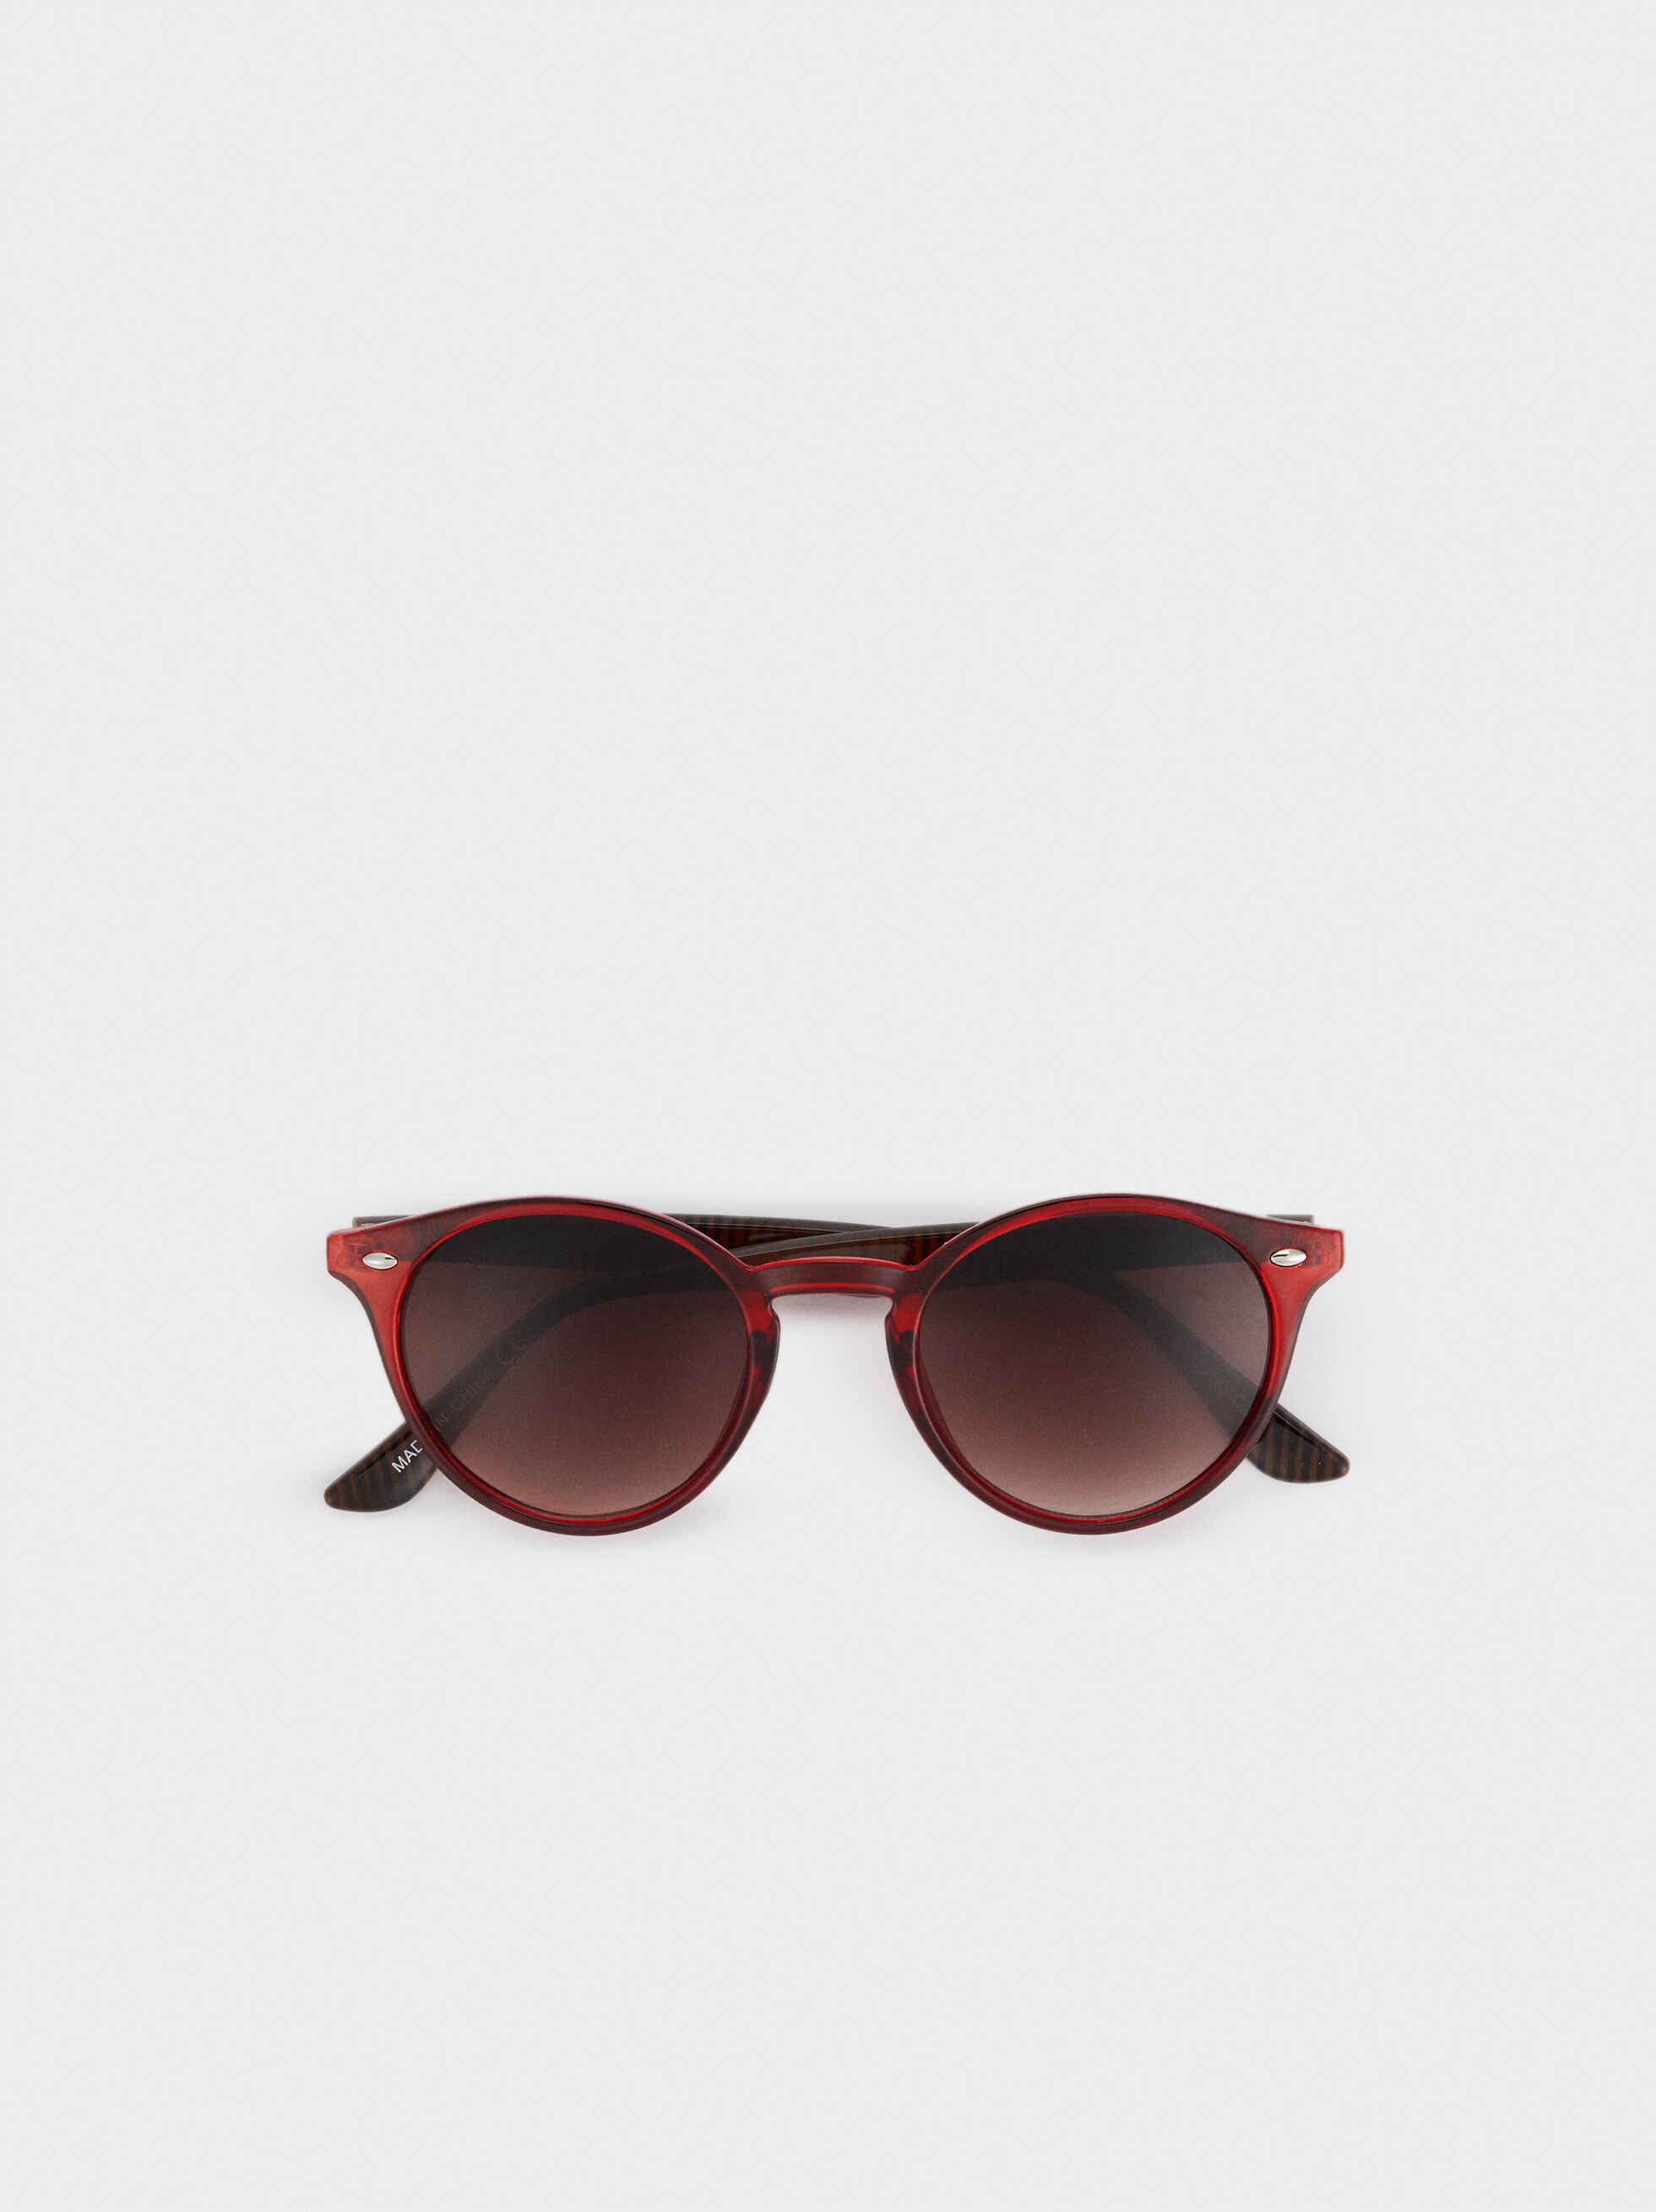 Round Resin Sunglasses, Red, hi-res